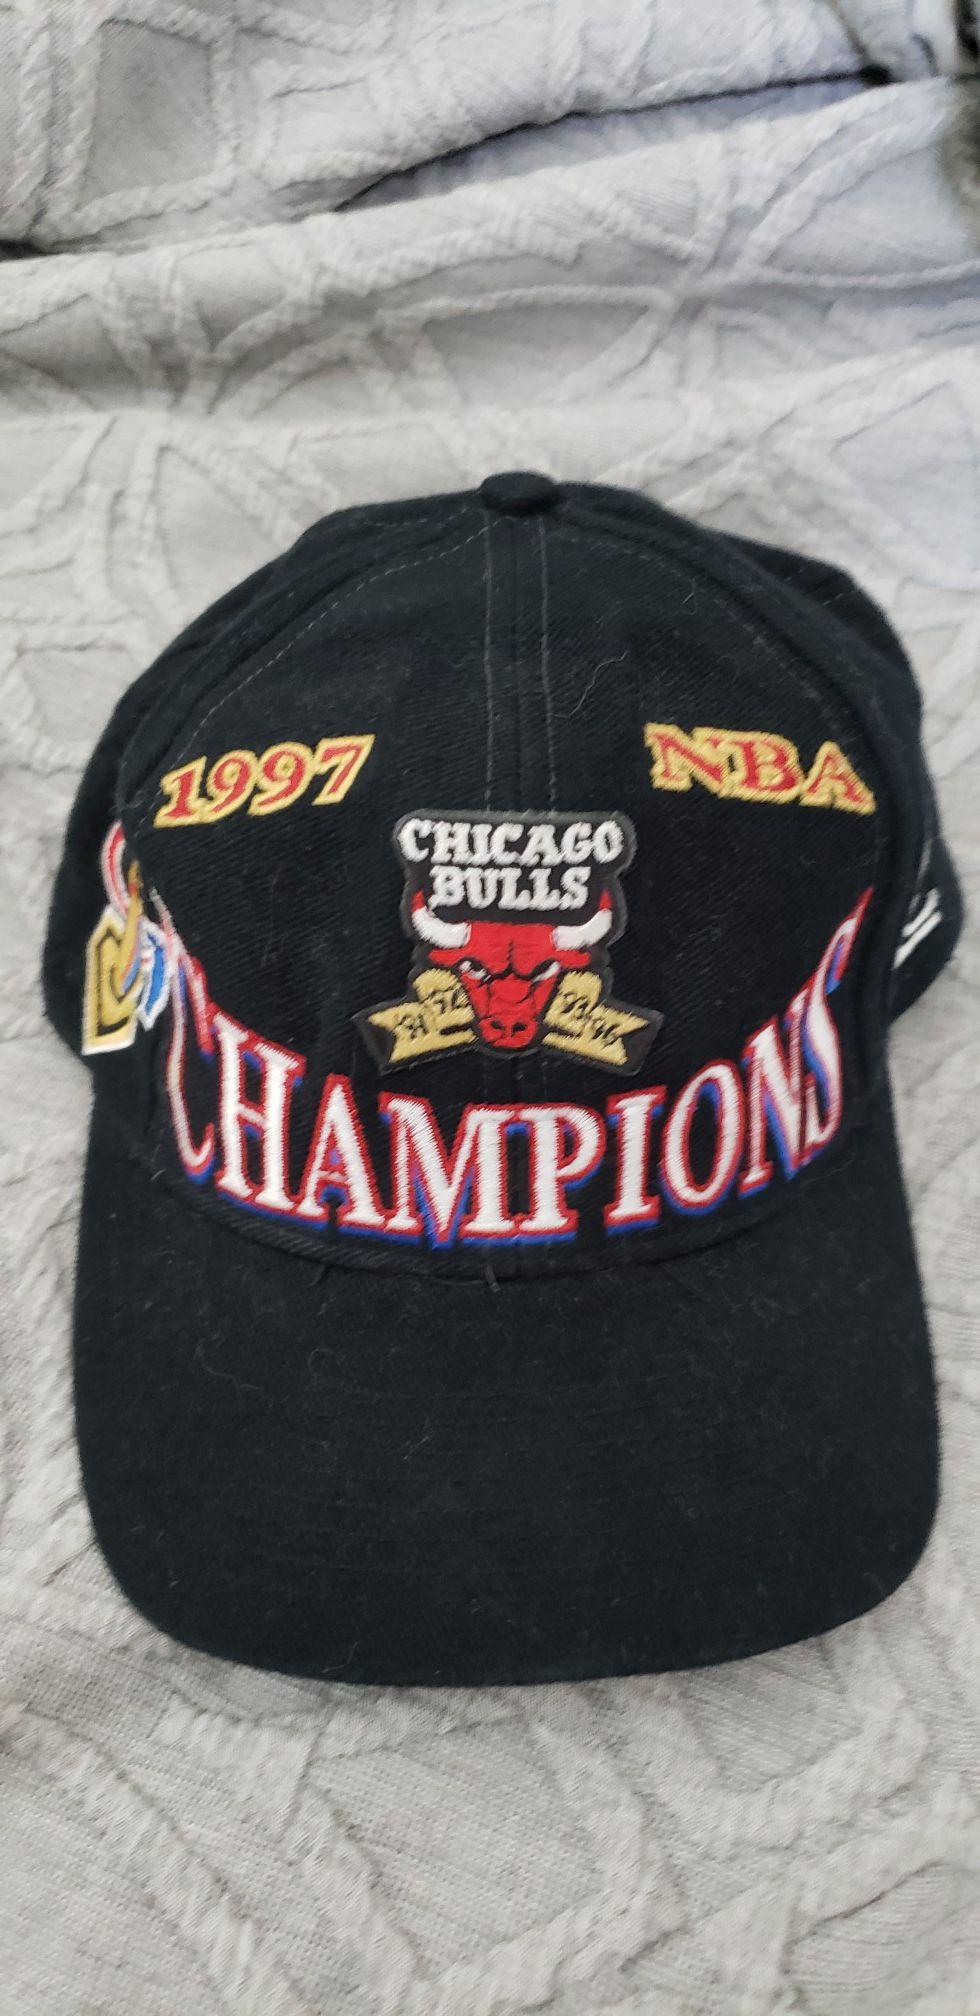 1997 Bulls NBA Championship hat